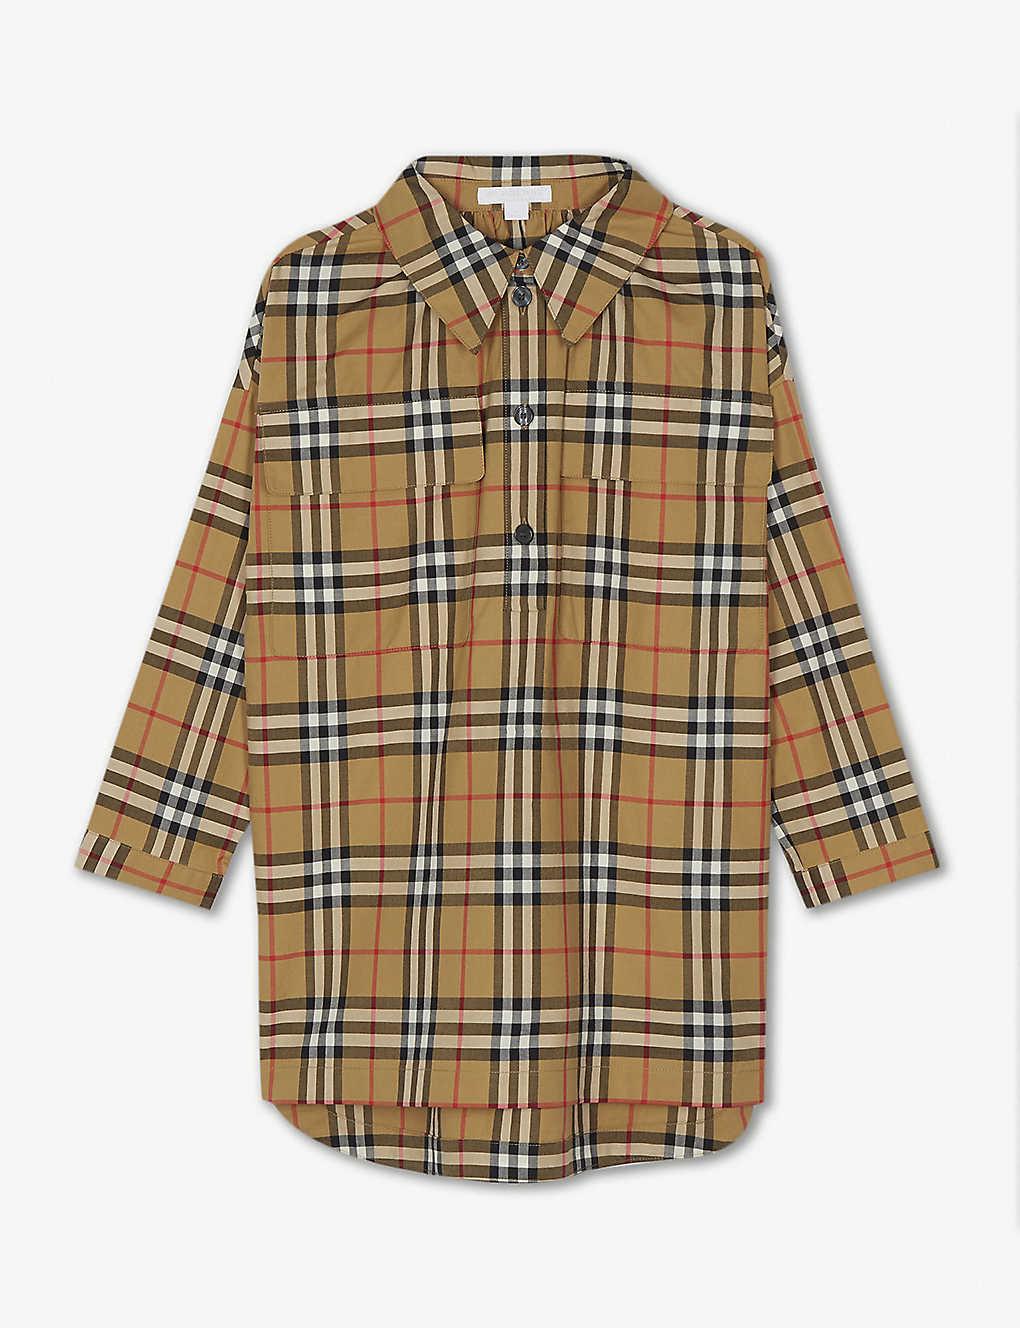 9d1d6757f8d BURBERRY - Vintage check cotton long-sleeve dress 4-14 years ...